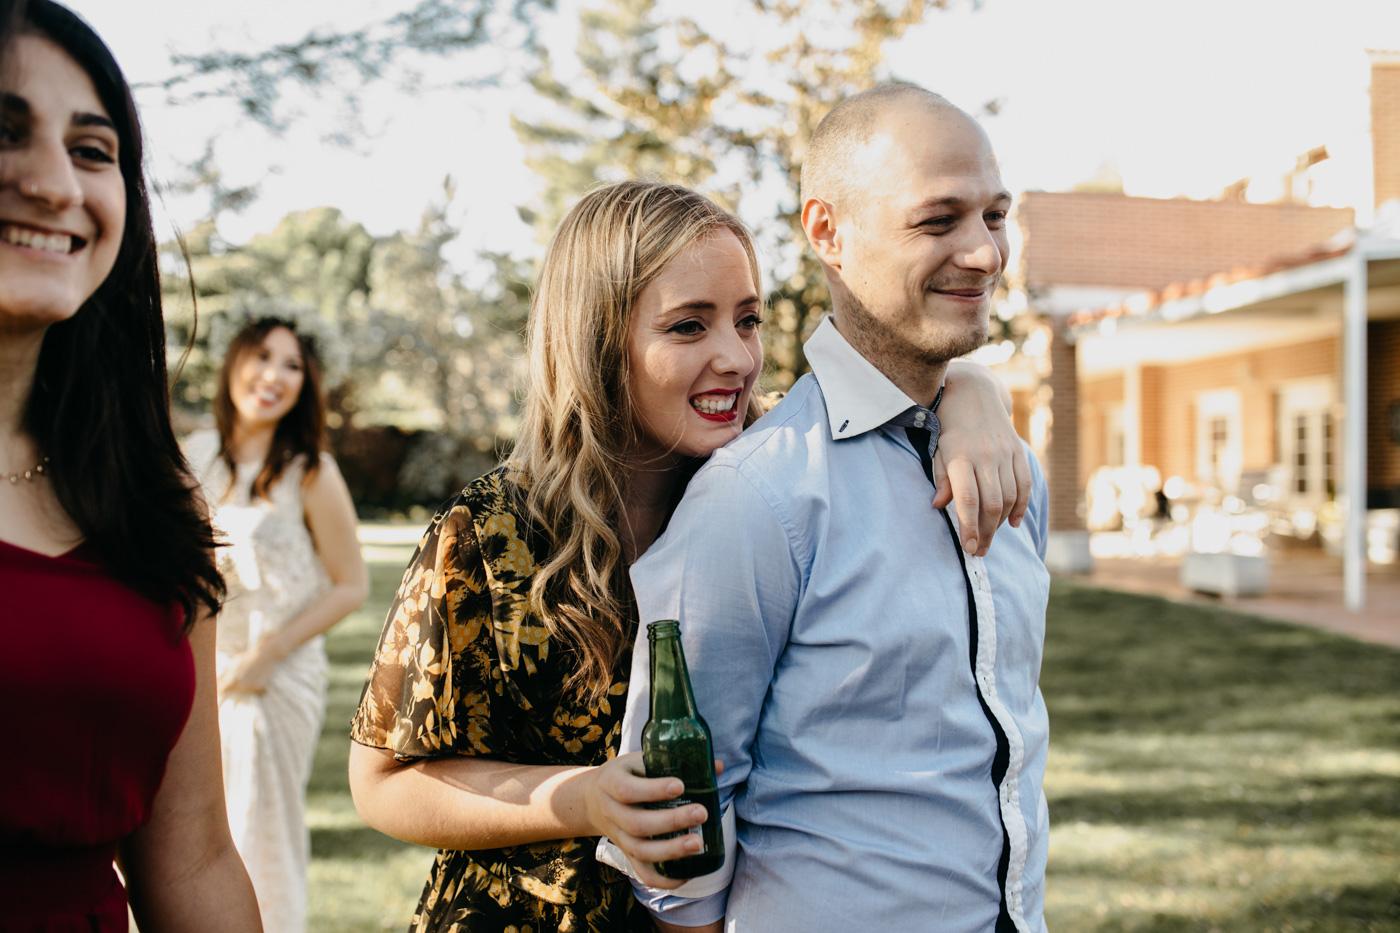 Velvet-Hush-fotografos-boda-al-aire-libre-madrid-060